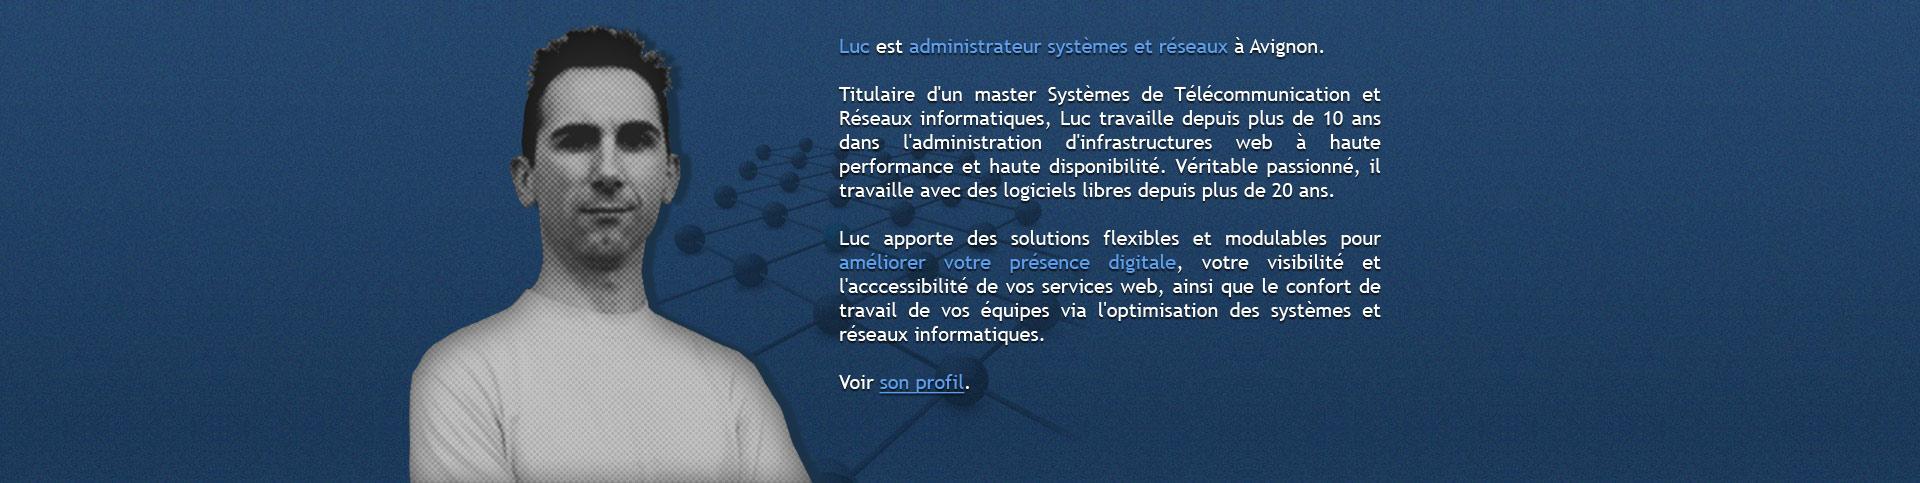 luc-administrateur-reseau